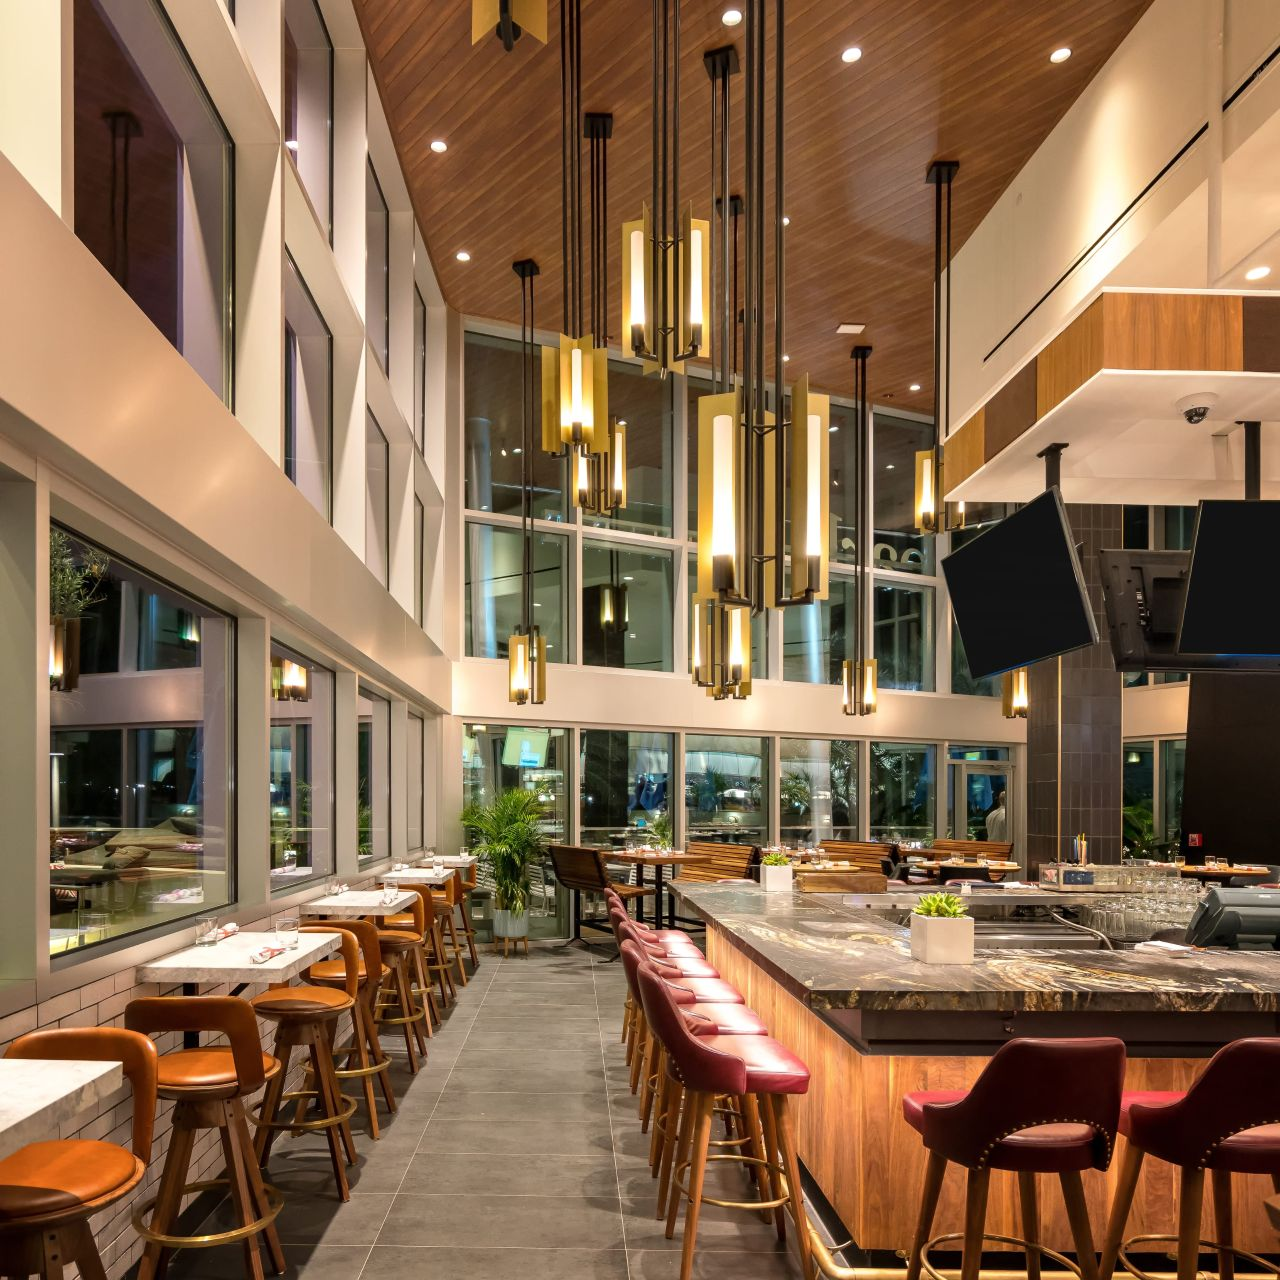 Earls kitchen + bar (lincoln park). Earls Kitchen Bar Mall At Millenia Restaurant Orlando Fl Opentable